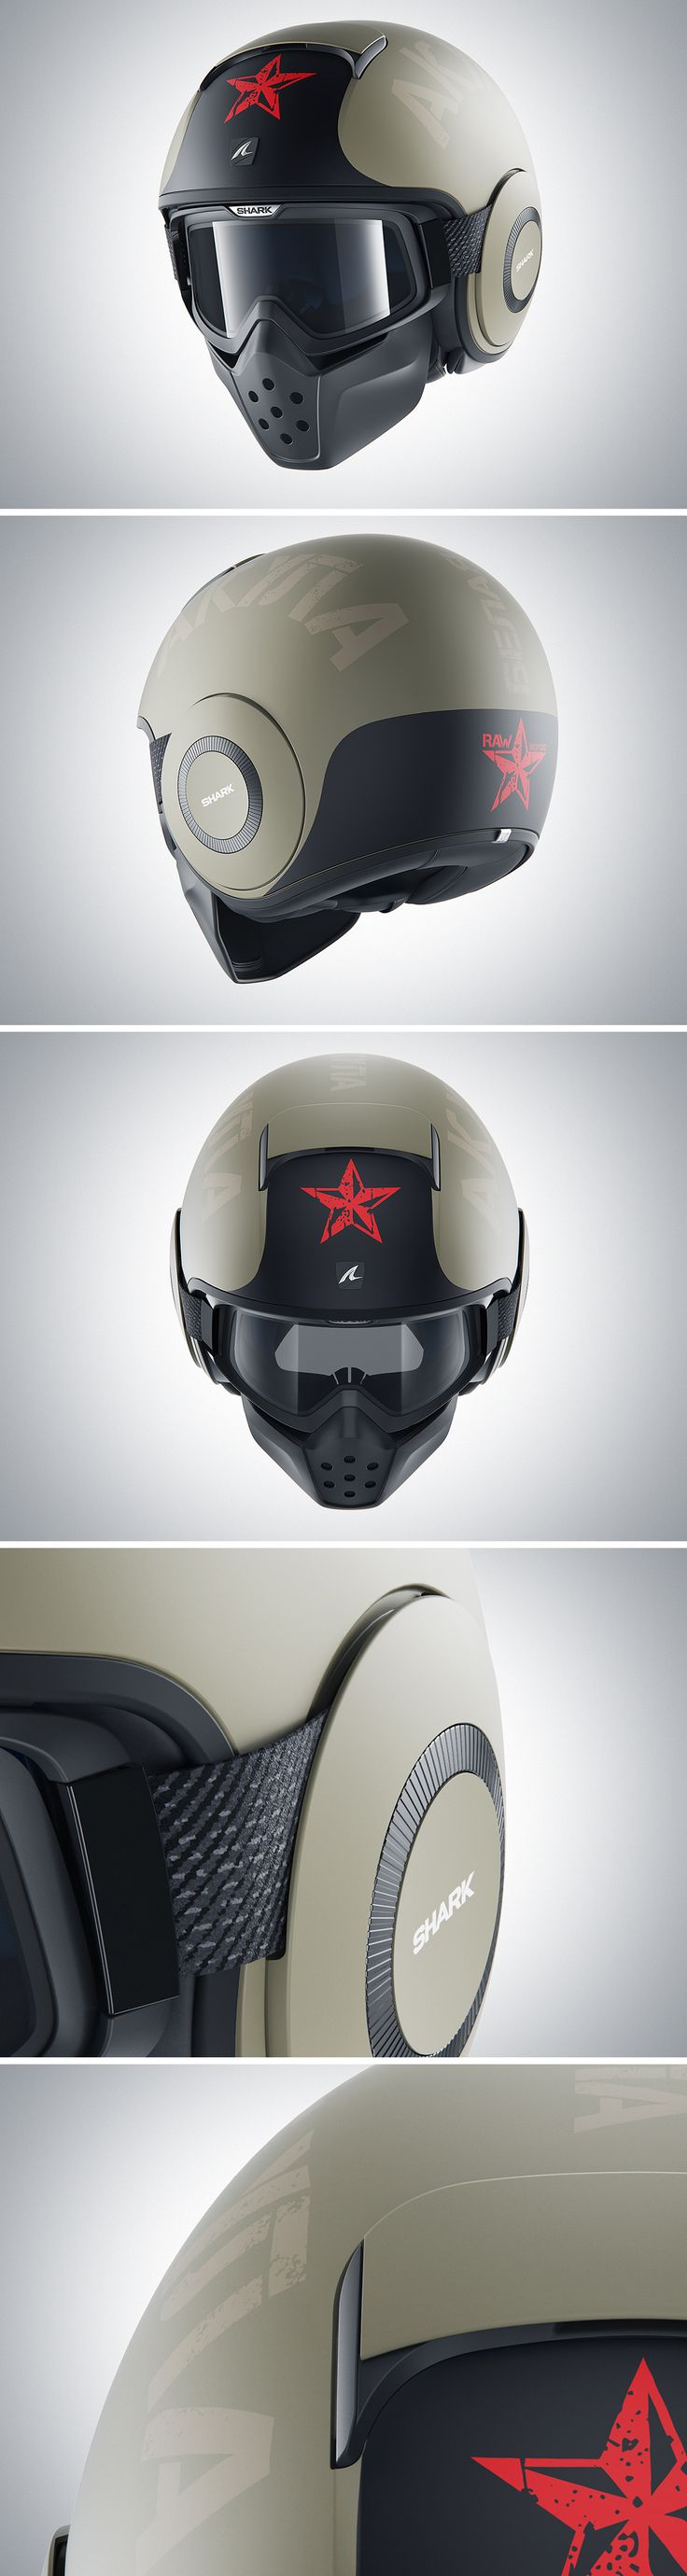 SHARK CGI Helmets on Behance